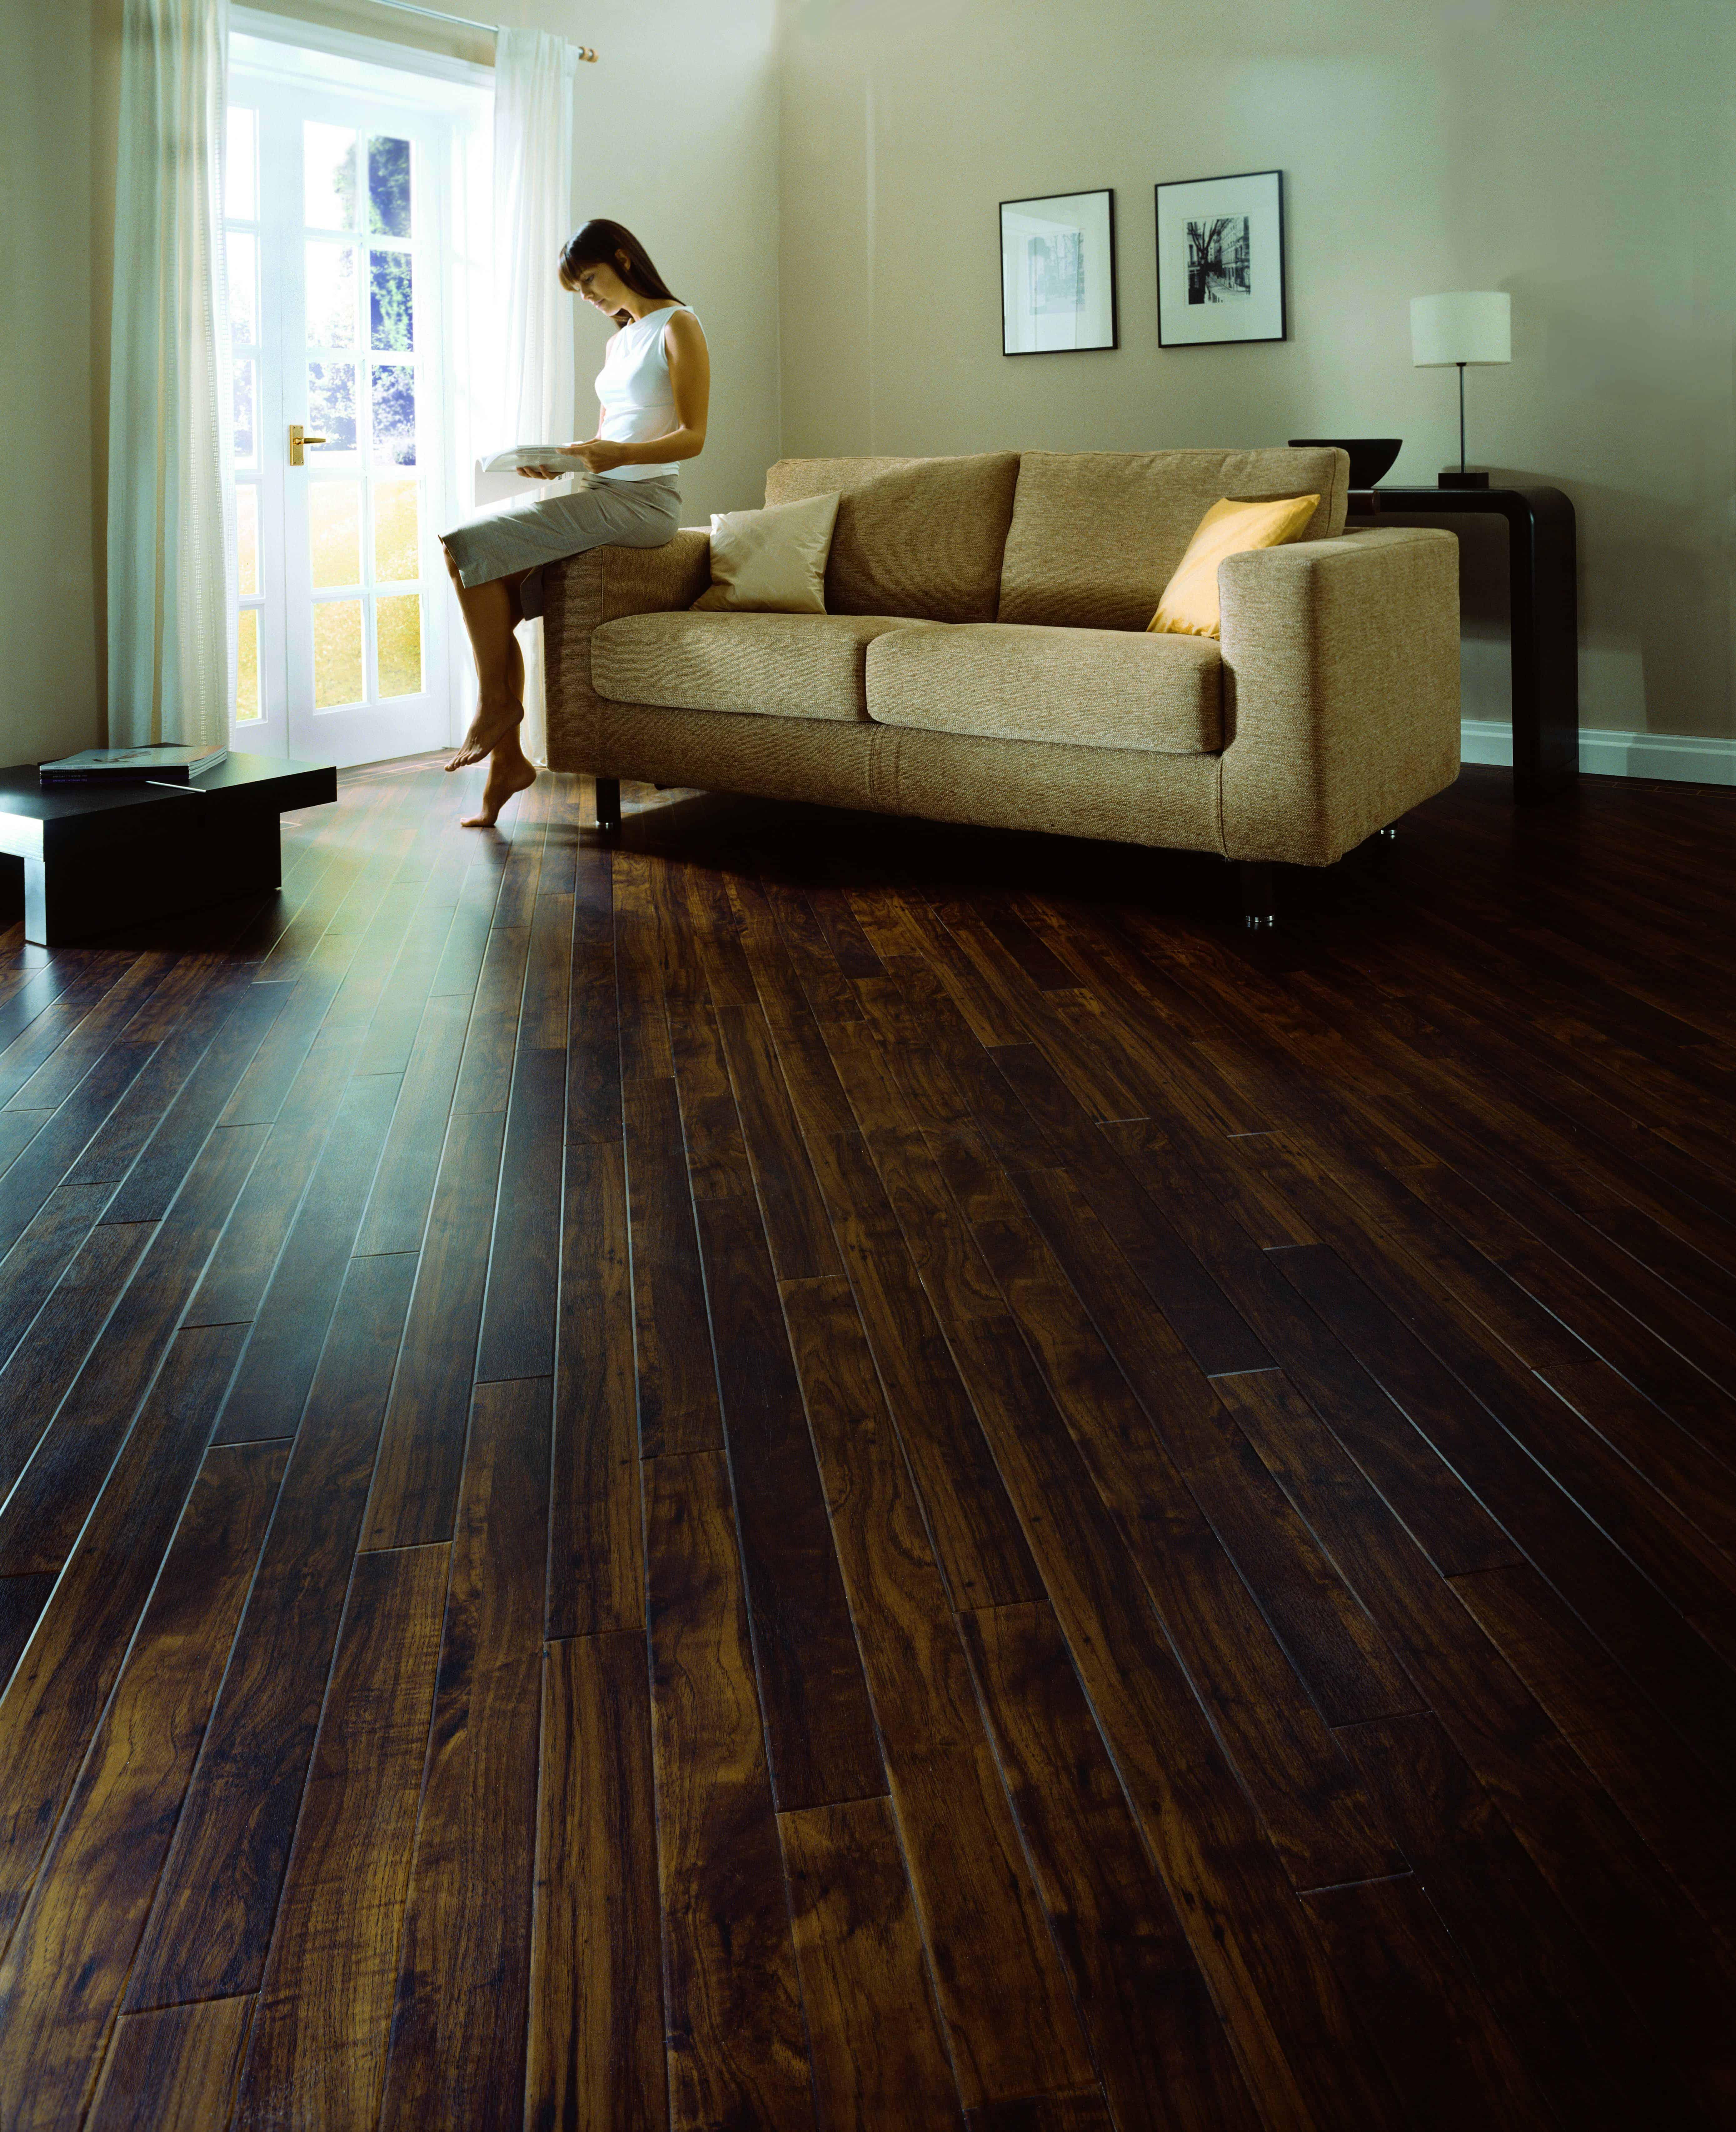 coretec flooring reviews 2015 home design ideas. Black Bedroom Furniture Sets. Home Design Ideas